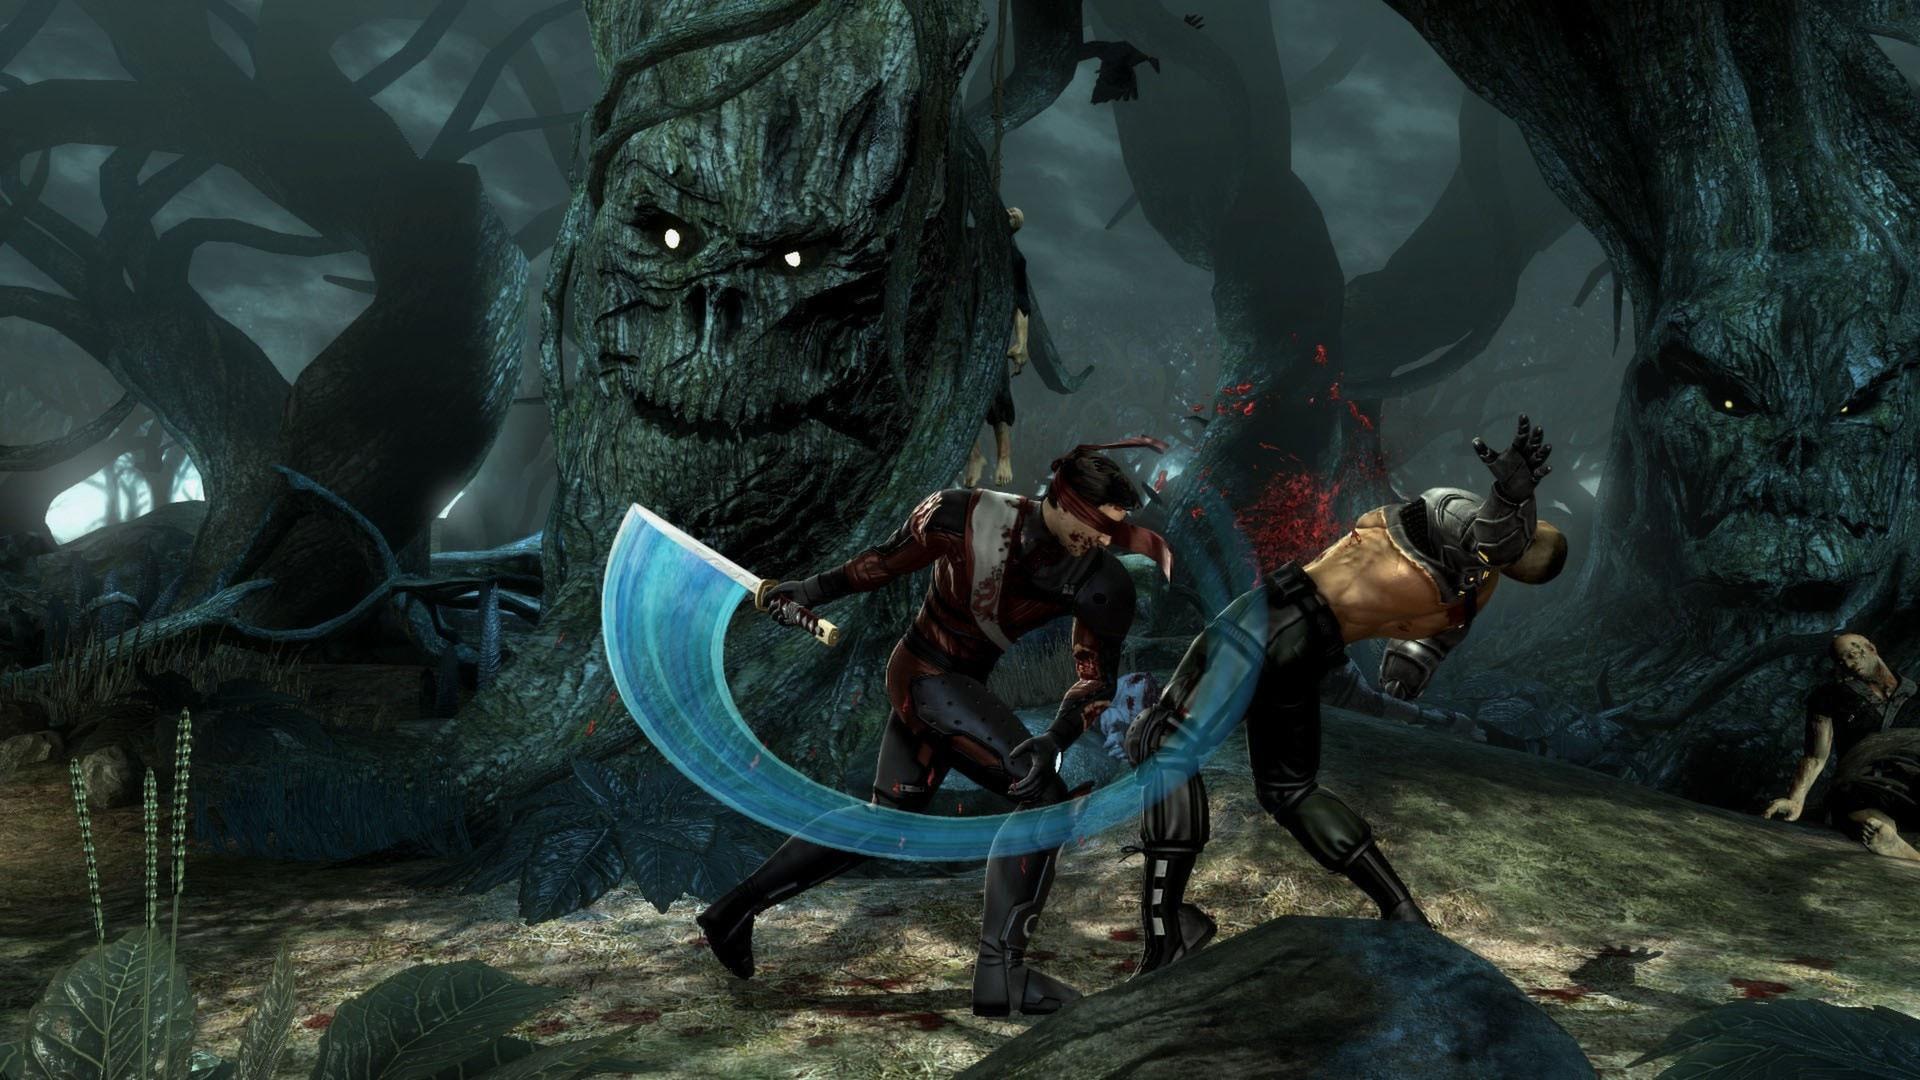 Mortal Kombat: Komplete Edition Steam Key GLOBAL - 3